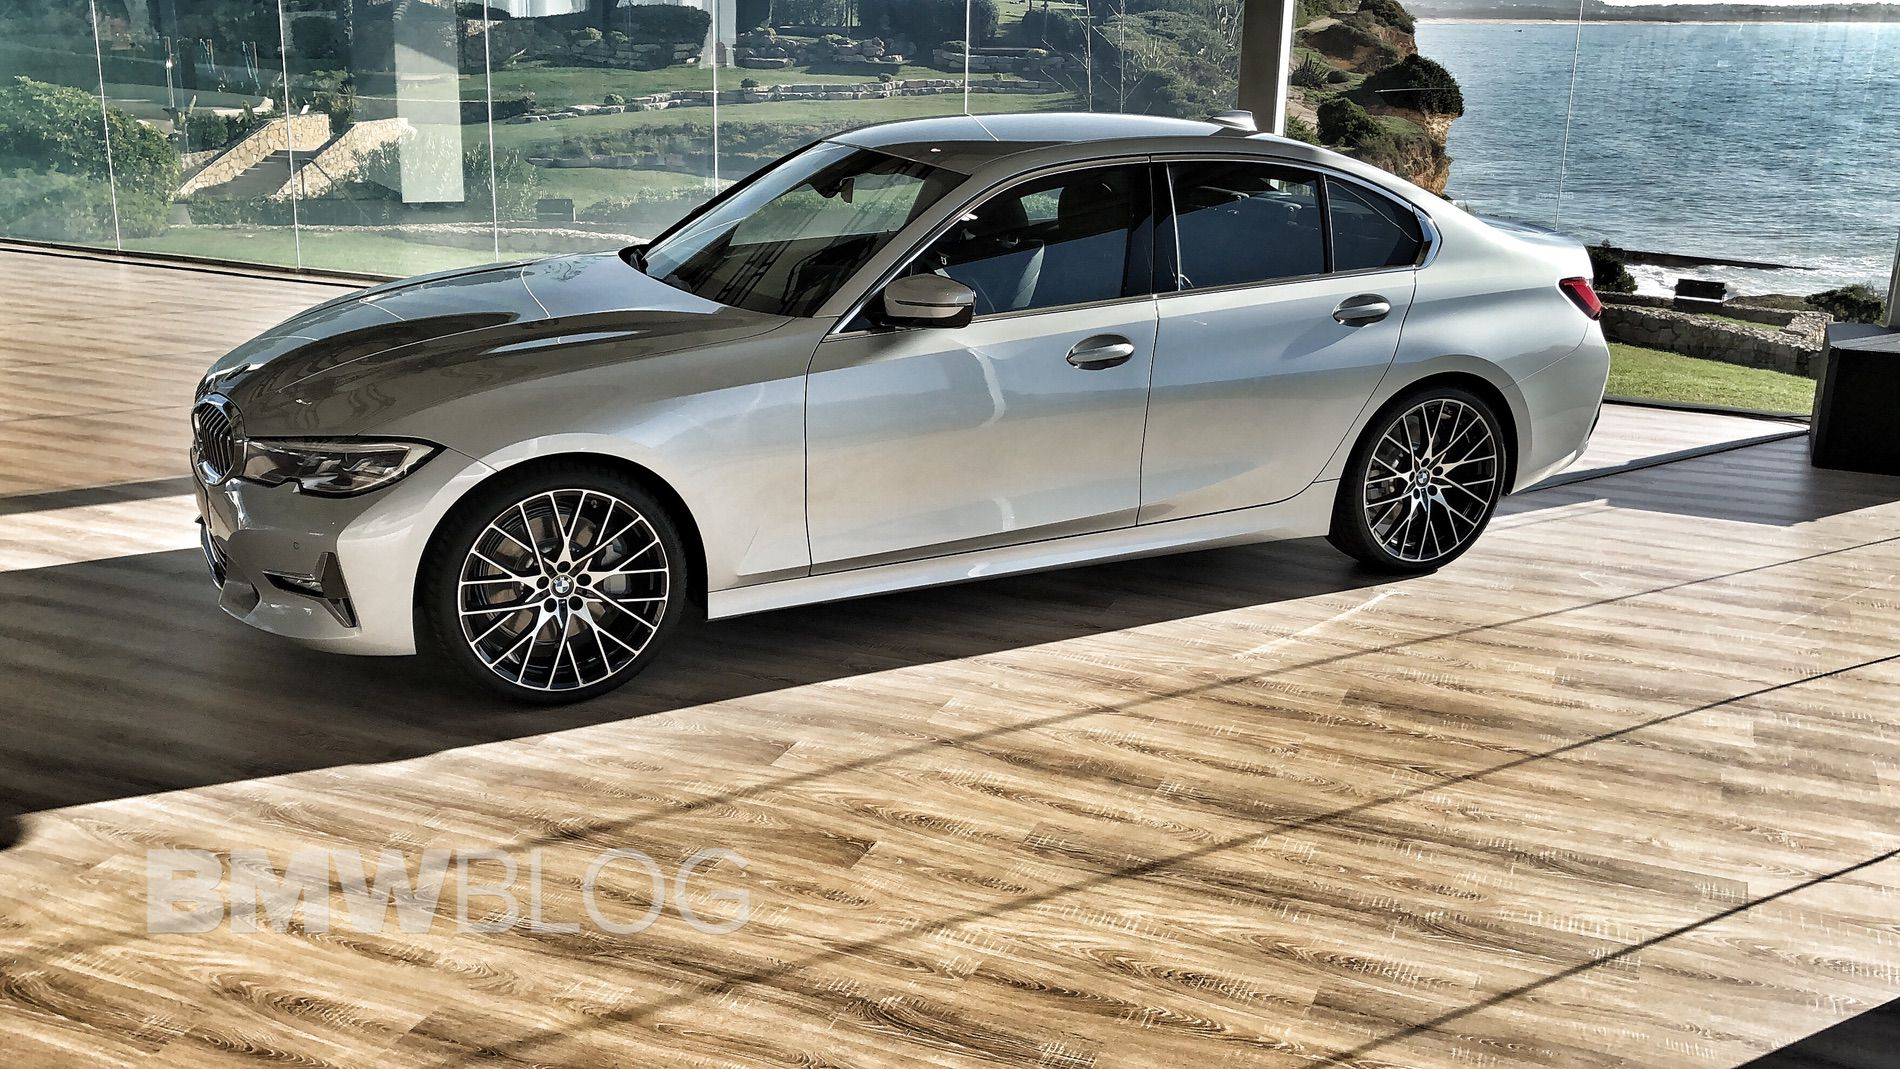 Video New 2019 G20 Bmw 3 Series In Glacier Silver Metallic I New Cars